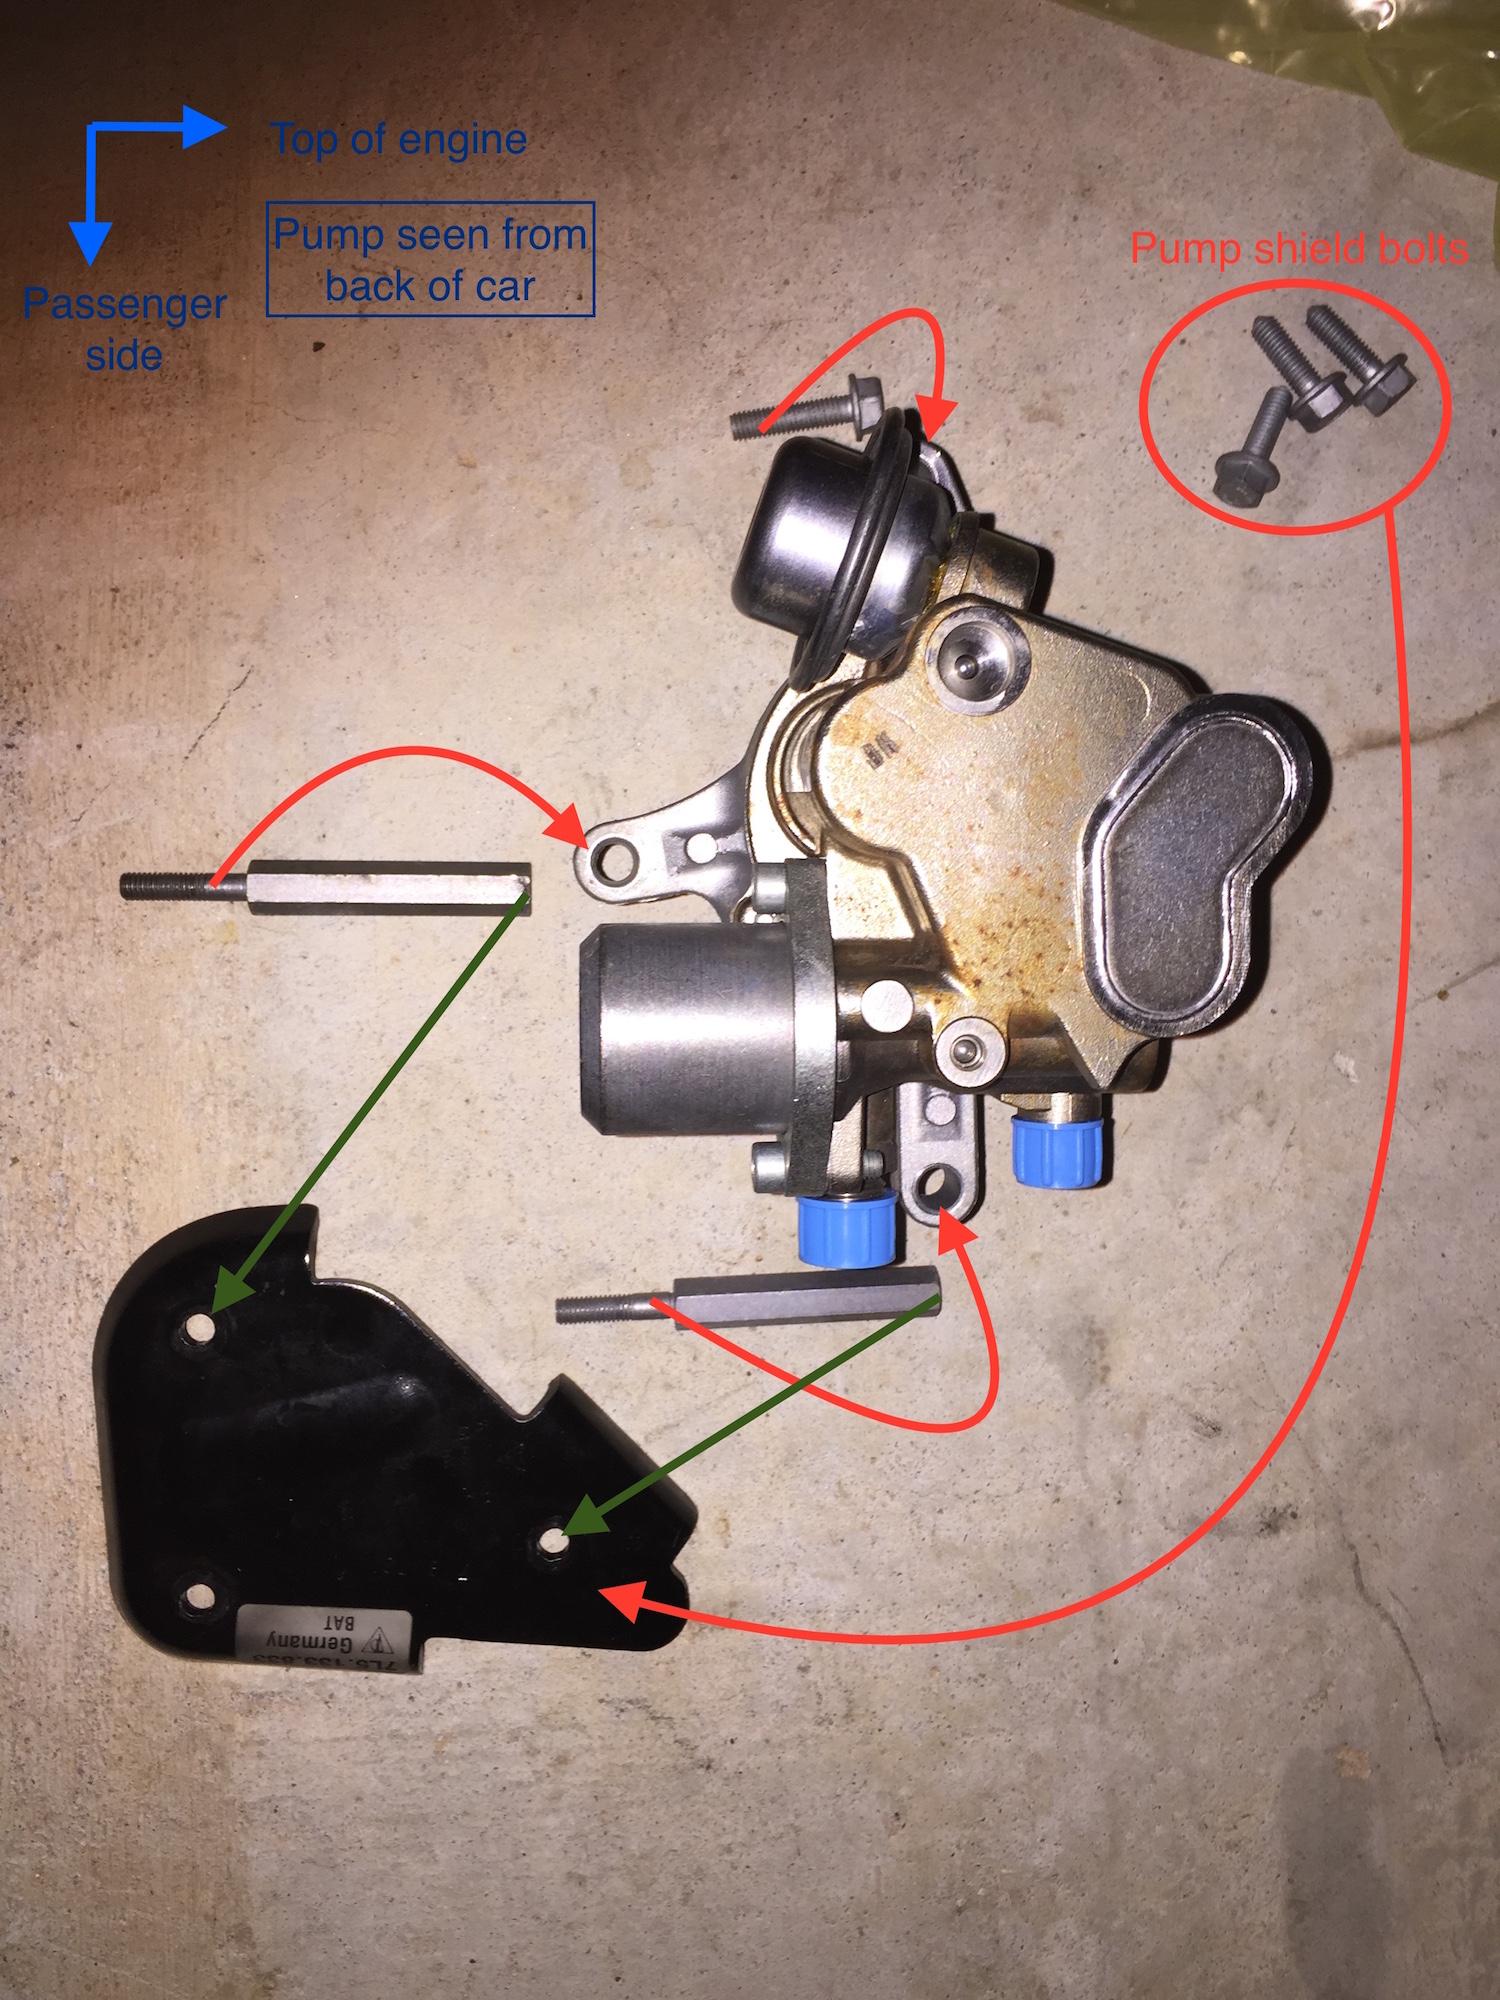 Cayenne S 2007-2010 (957) High Pressure Fuel Pump (HPFP